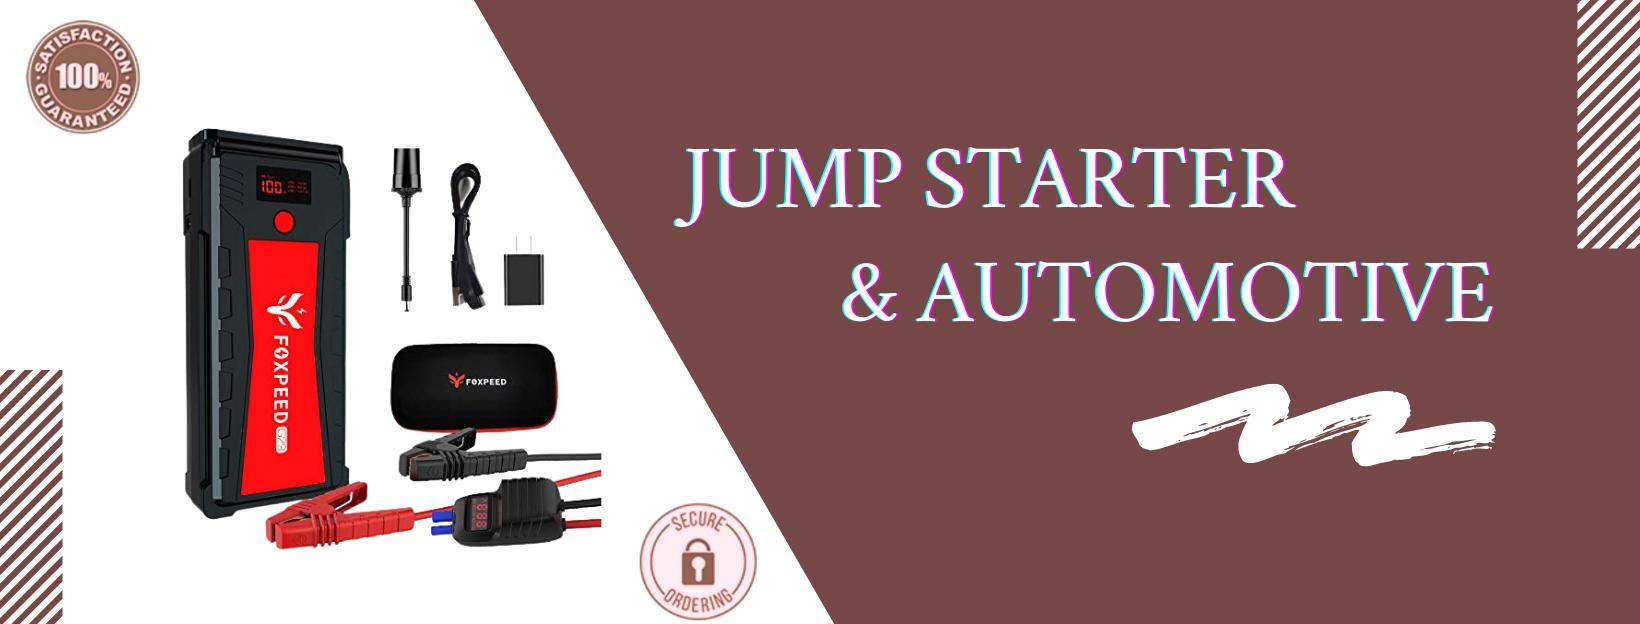 Jump Starte & Automotive